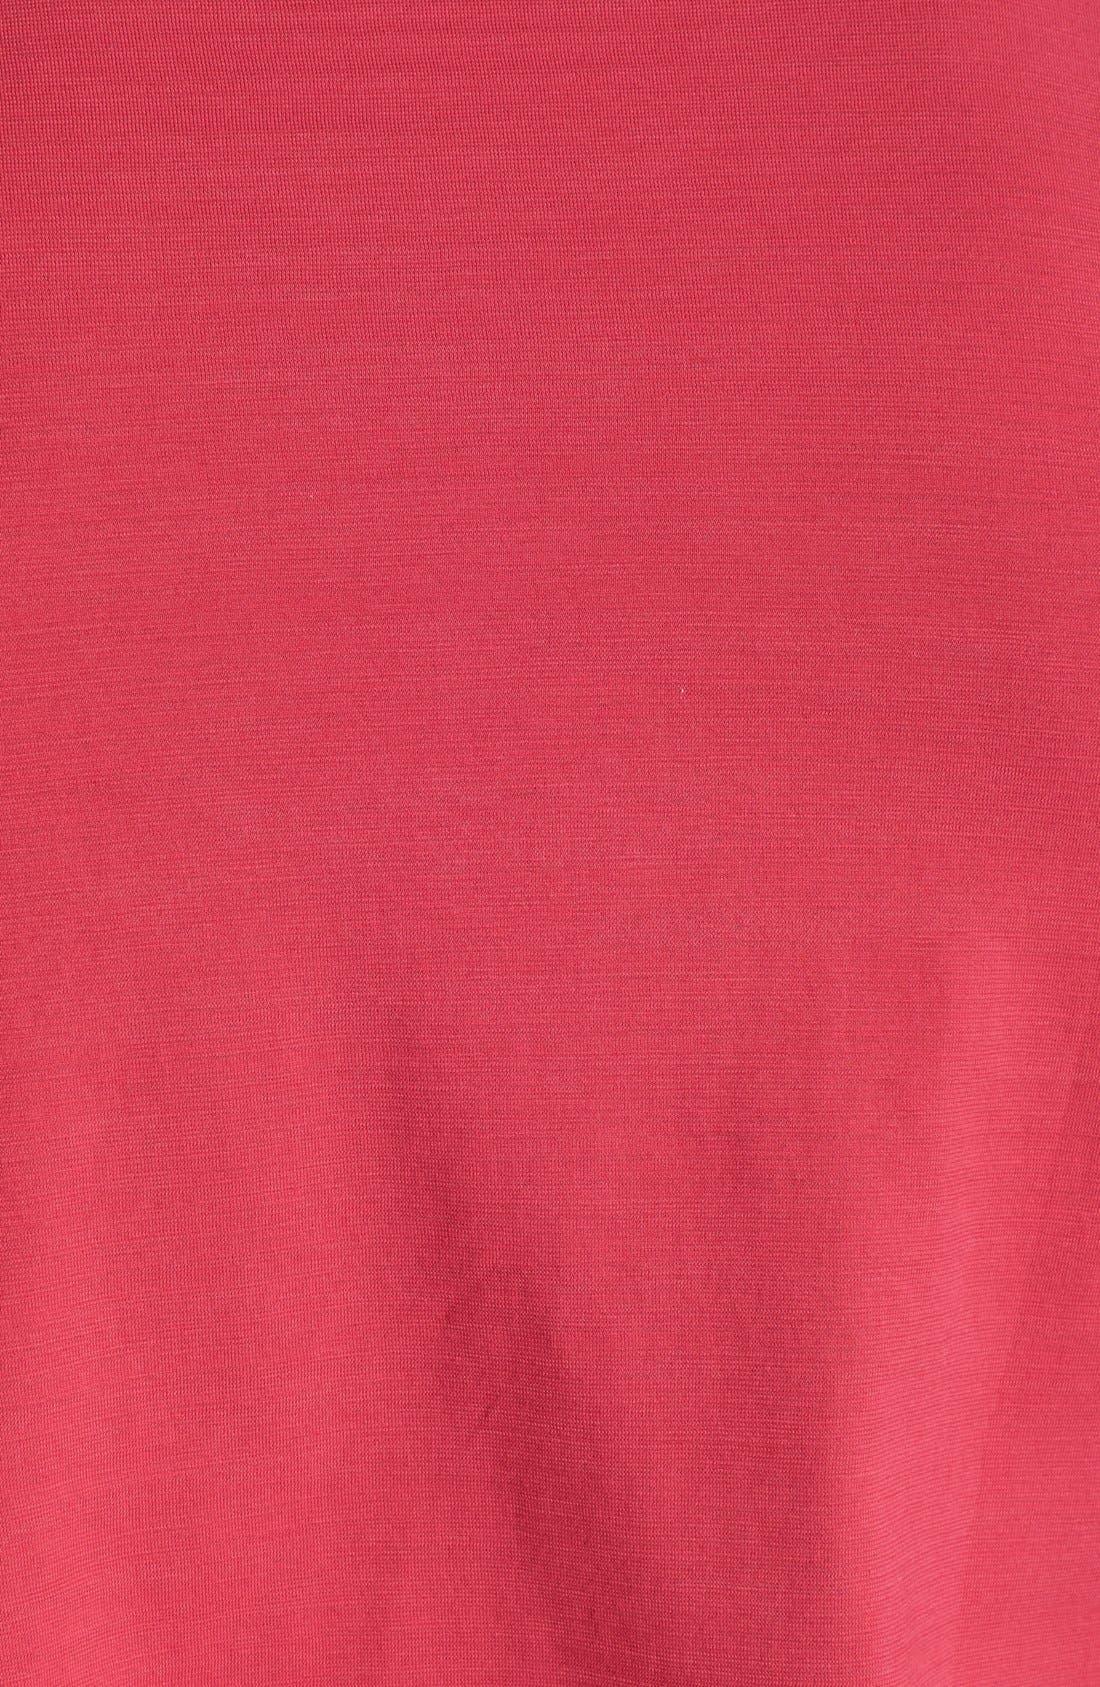 Alternate Image 3  - BOSS HUGO BOSS 'Terni 103' Regular Fit Crewneck T-Shirt